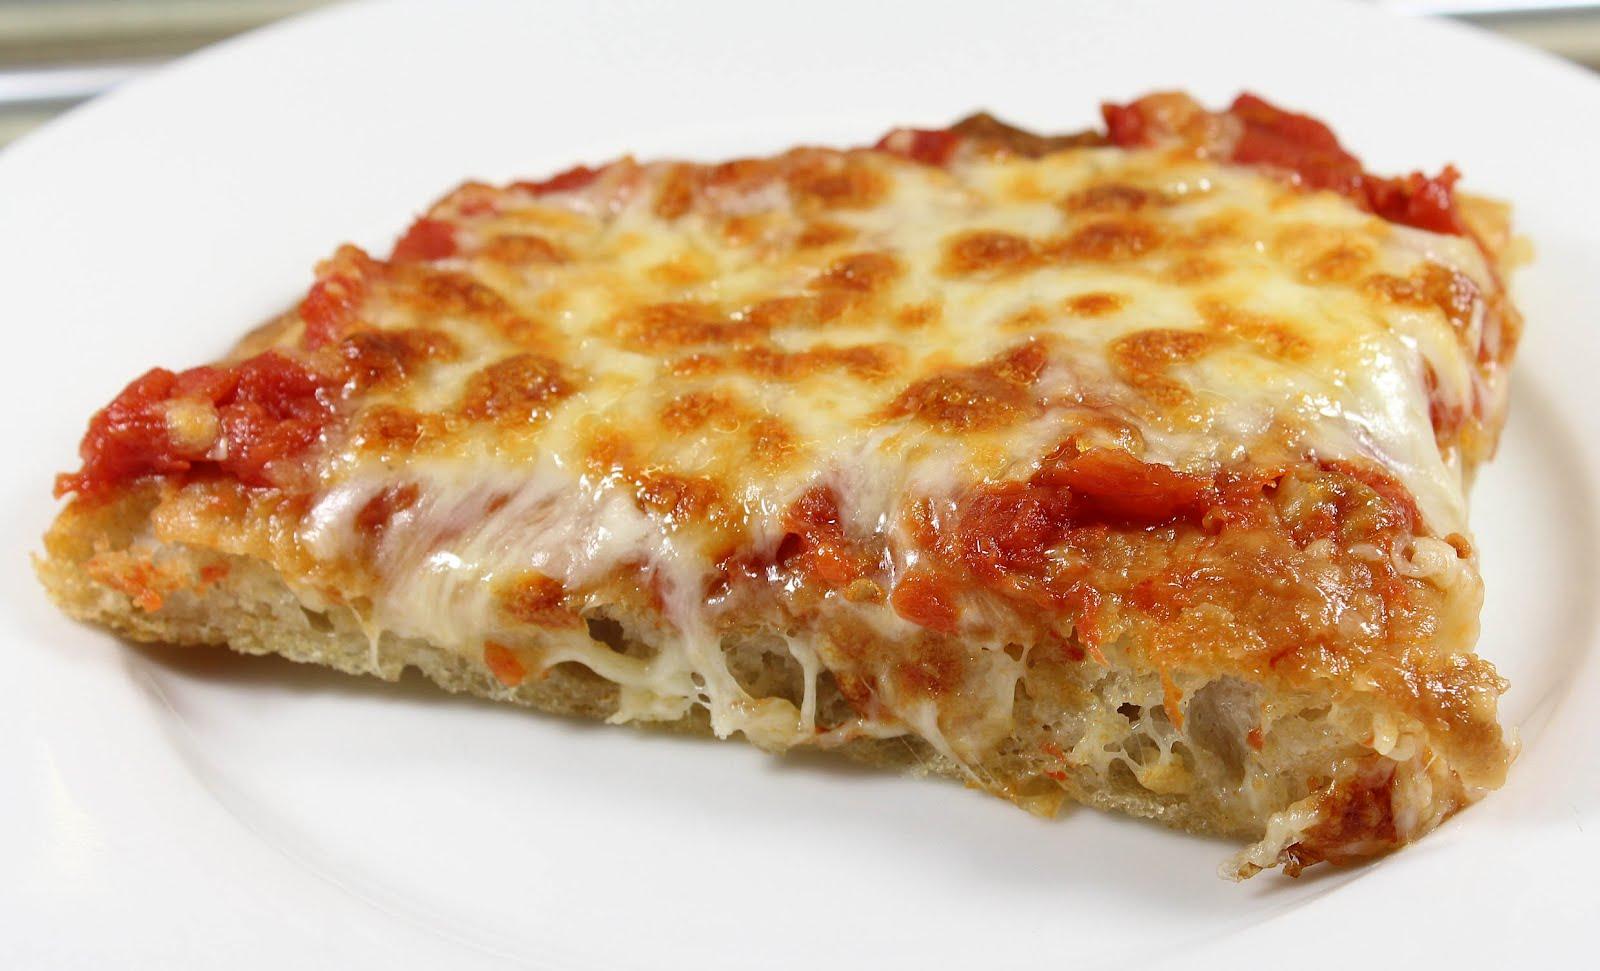 Cook S Kitchen Pizza